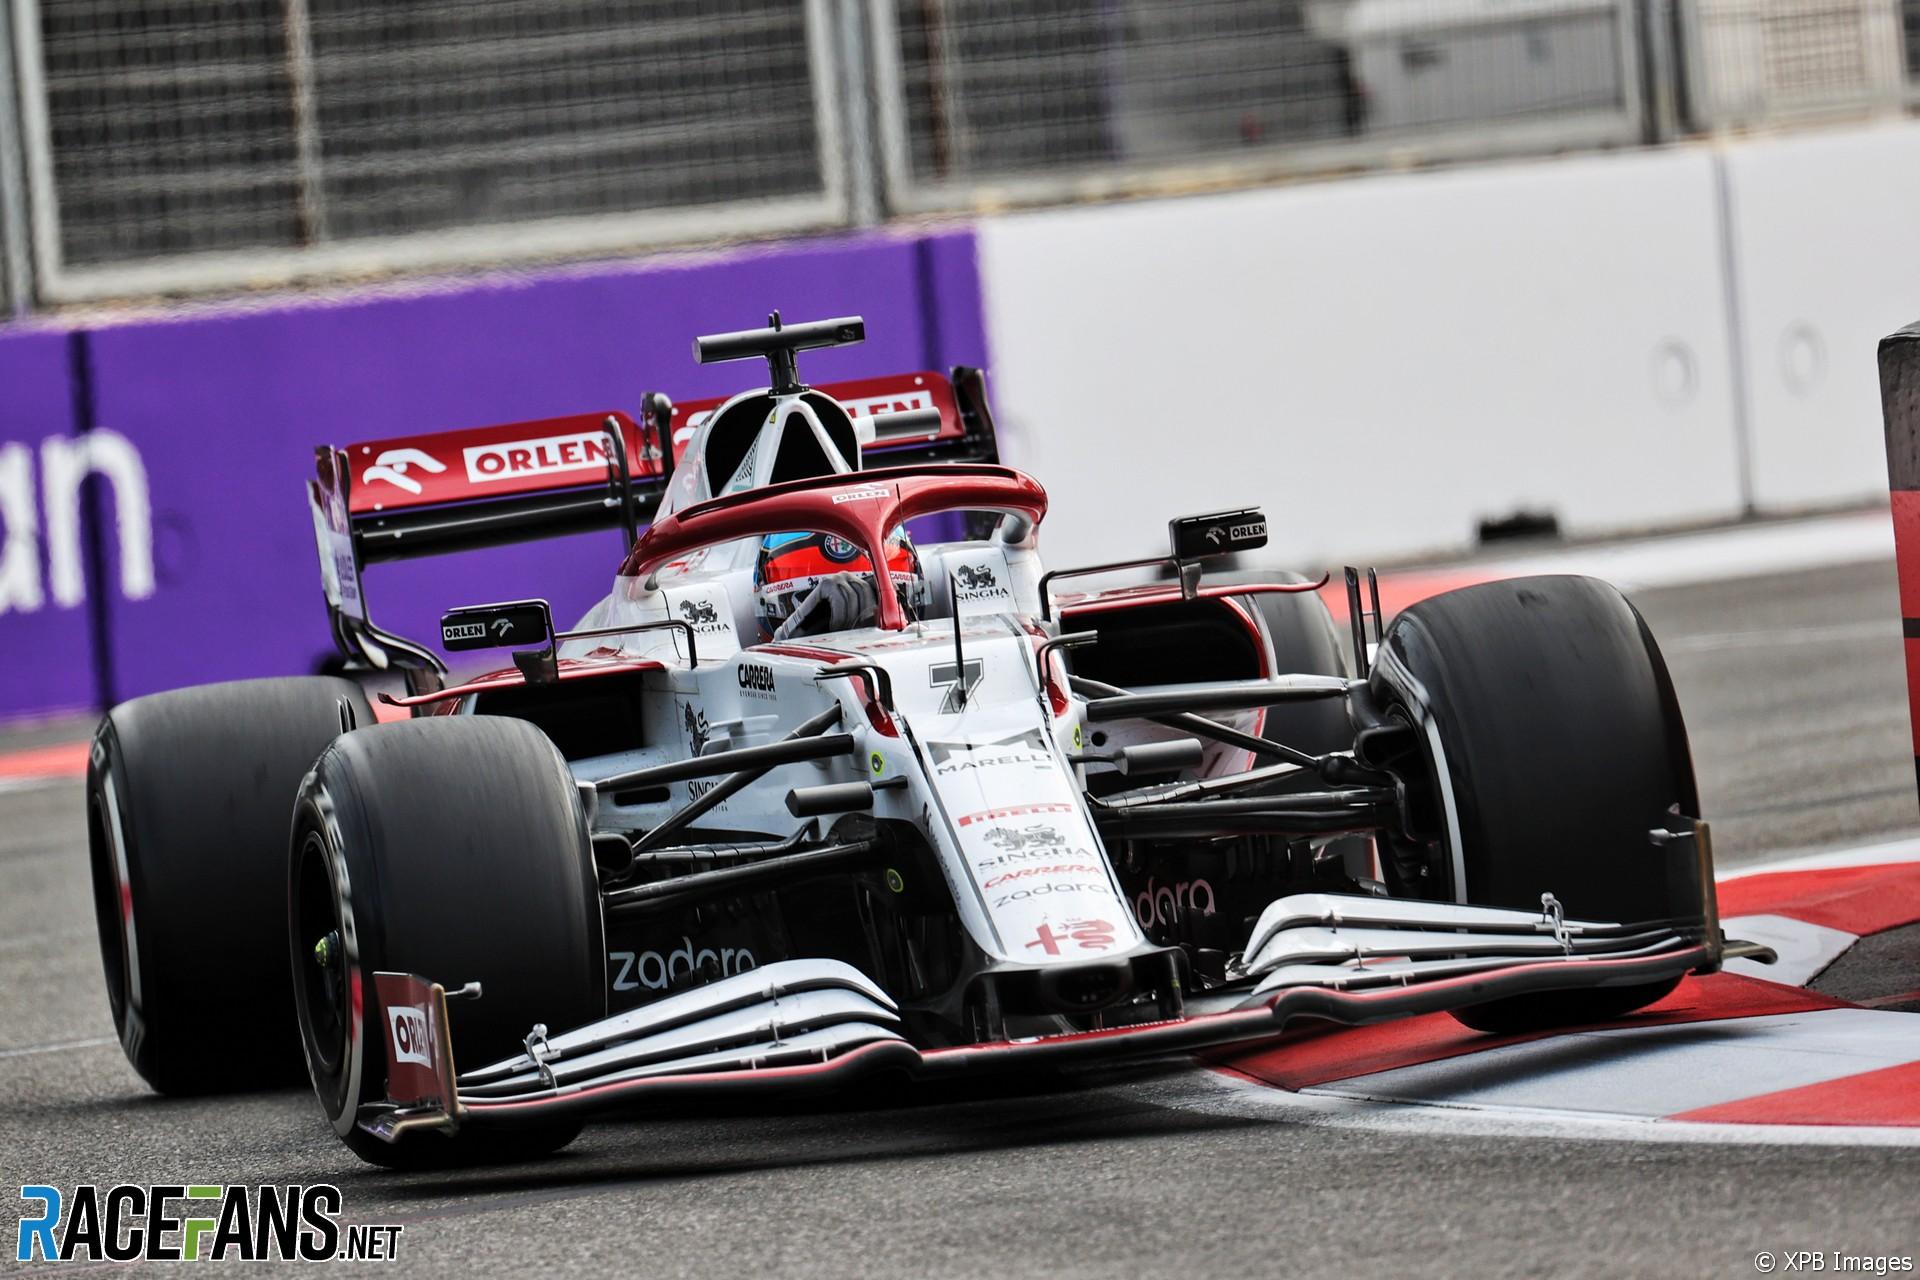 Kimi Raikkonen, Alfa Romeo, Baku City Circuit, 2021